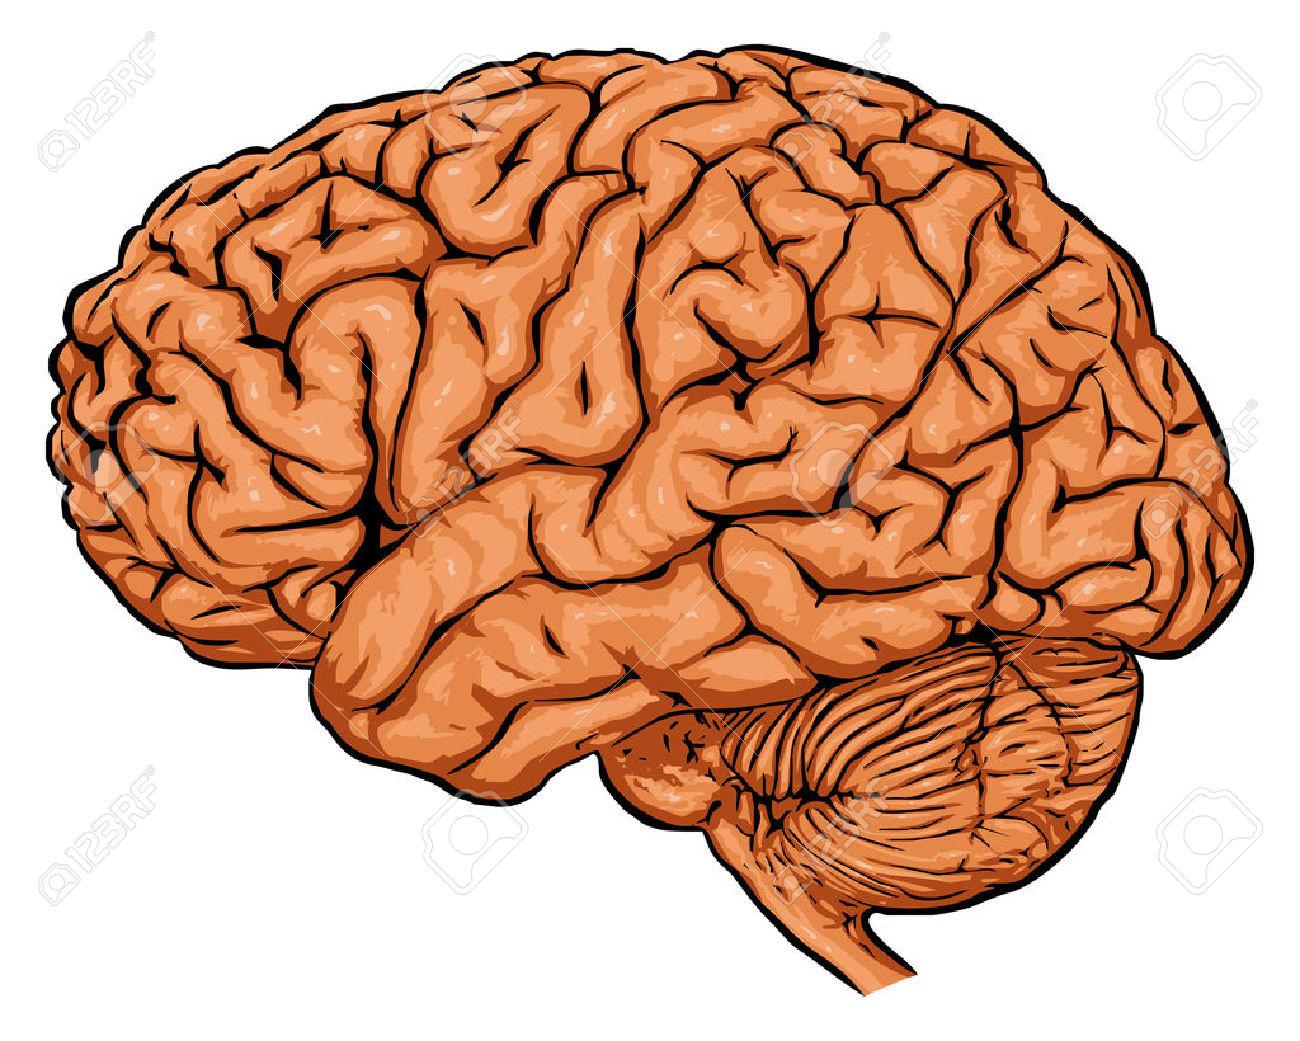 brain clipart brain clipart panda free clipart images rh clipartpanda com Thinking Brain Clip Art brain pictures clip art